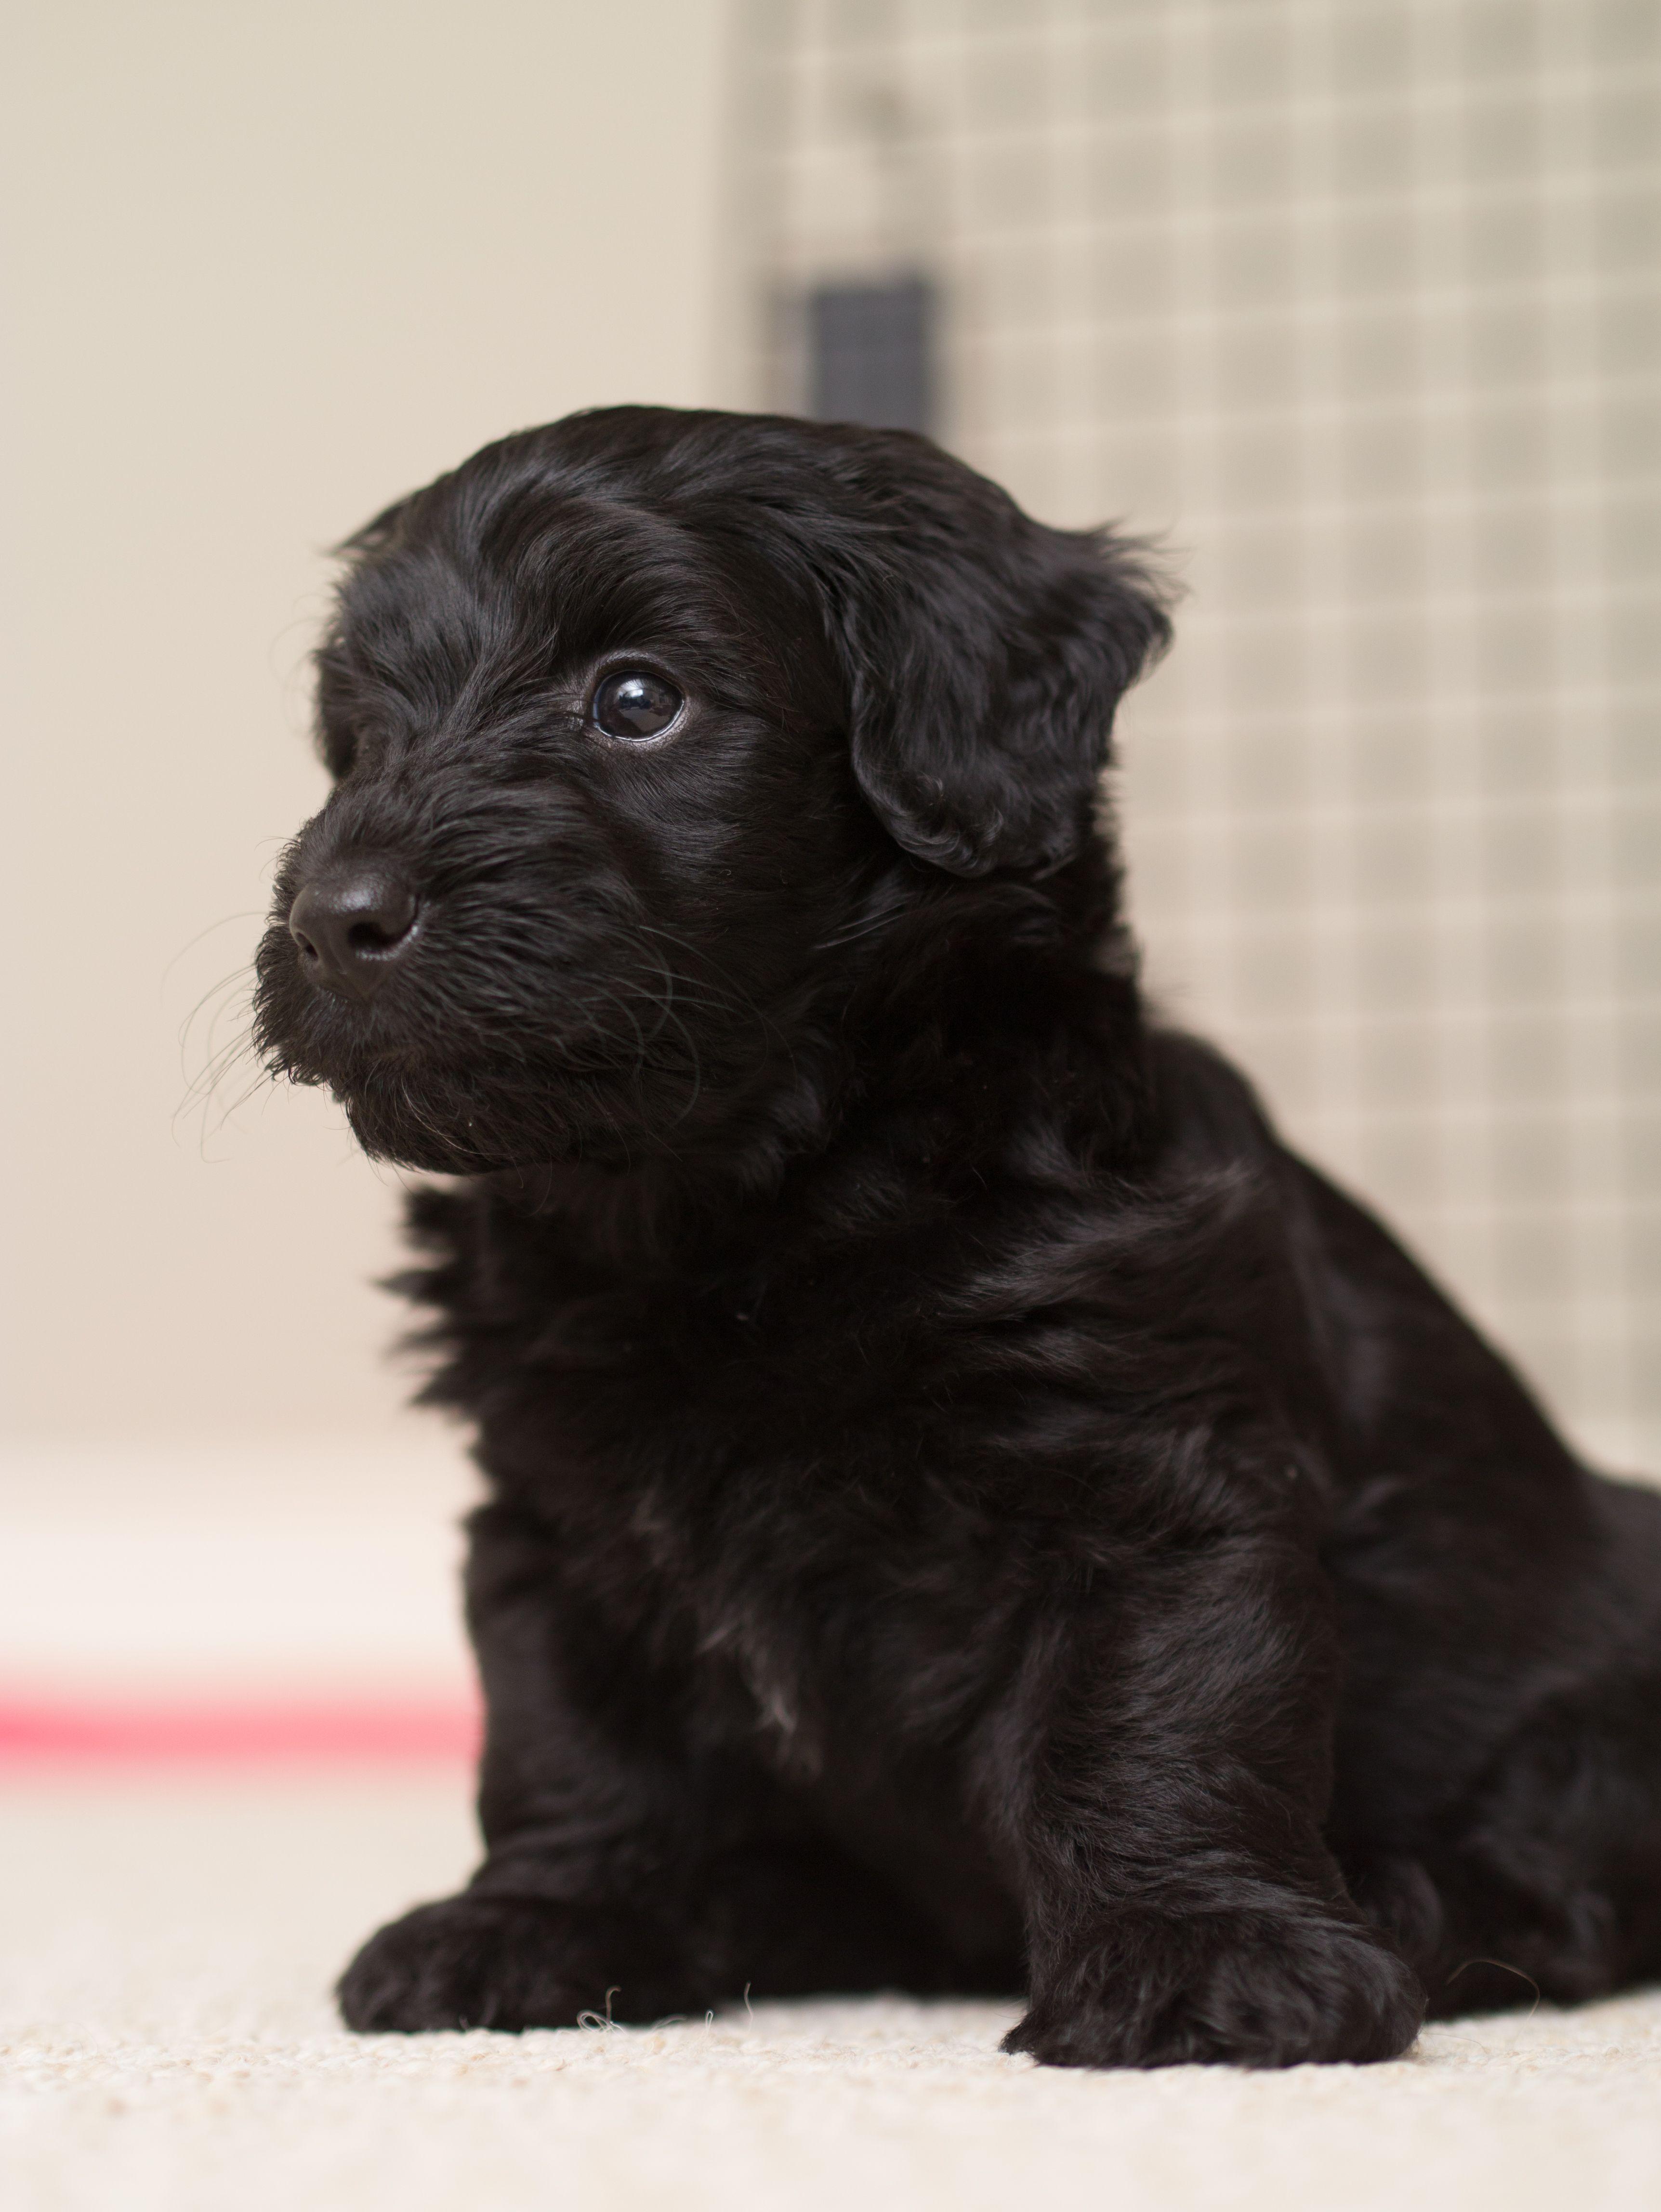 This Is Vinegar The Cutest Scottie Poo Puppy